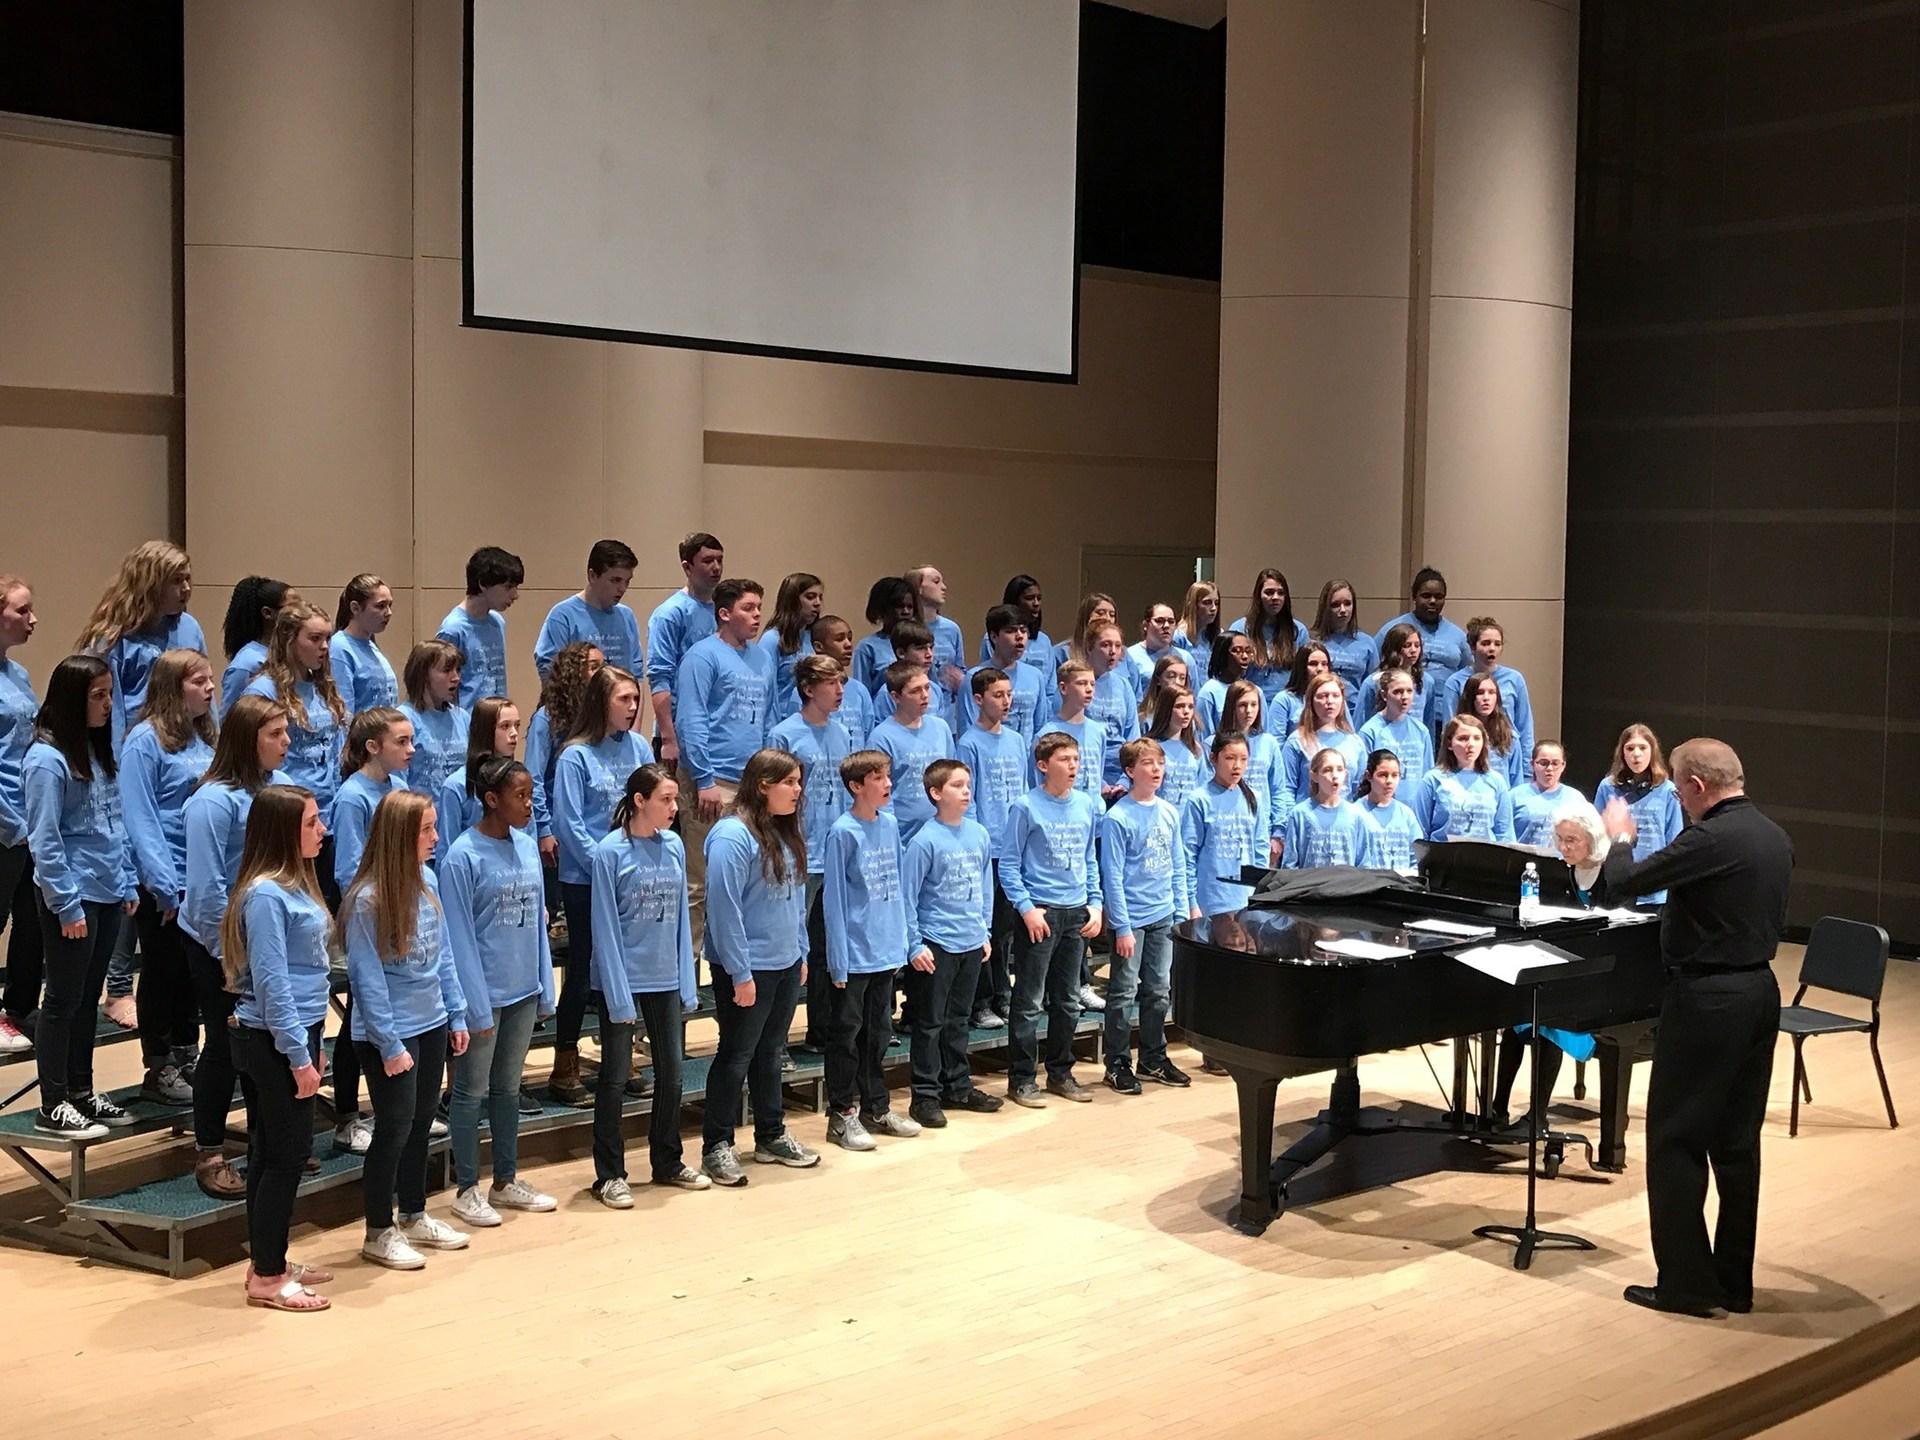 Anderson University Choral Workshop